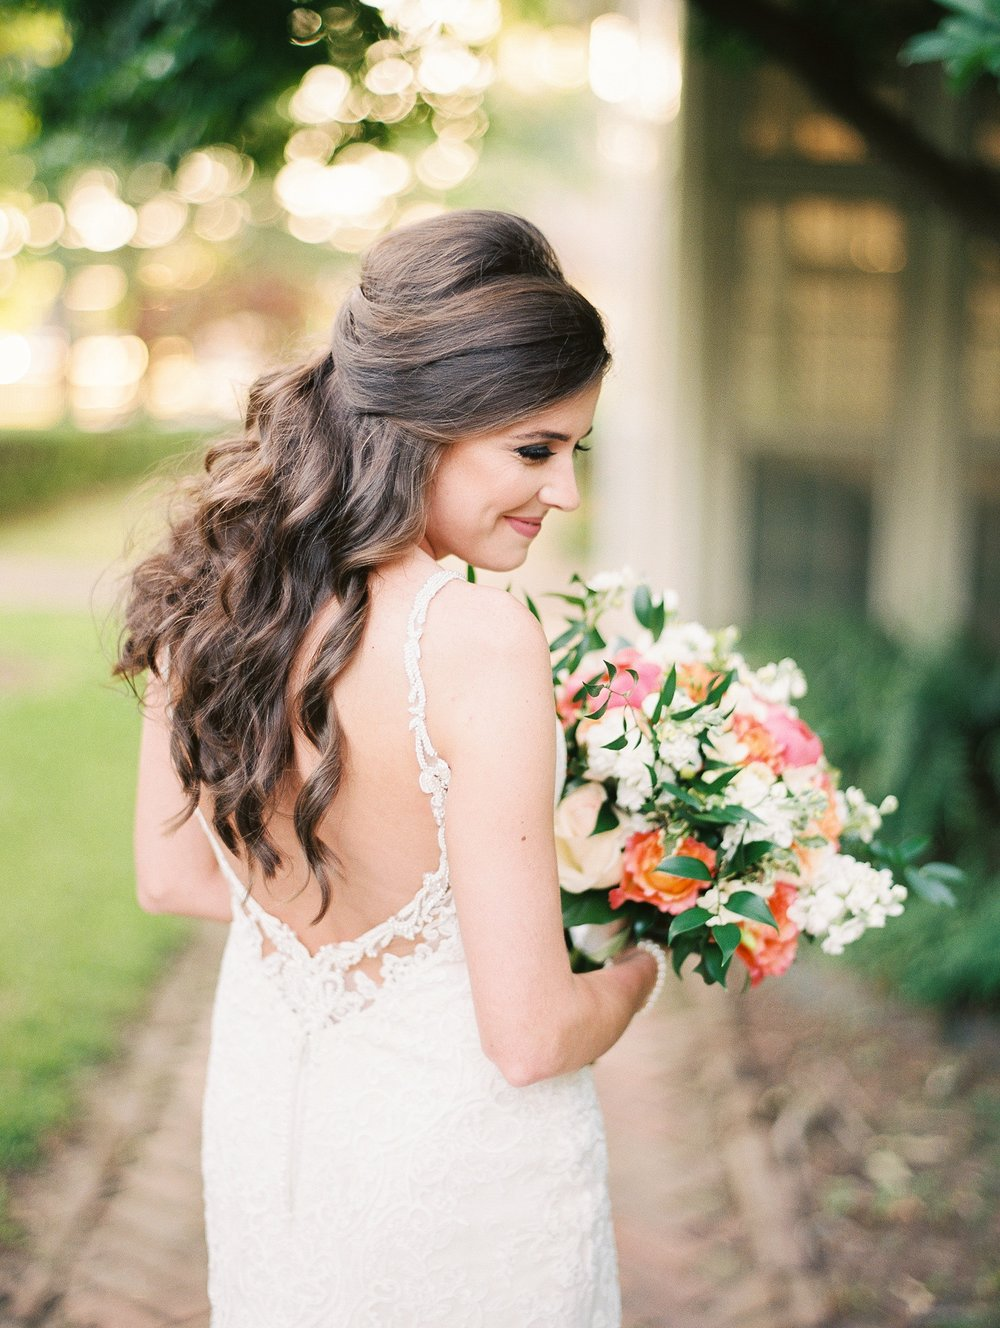 The-Terry-House-Wedding-Little-Rock-Arkansas_0097.jpg